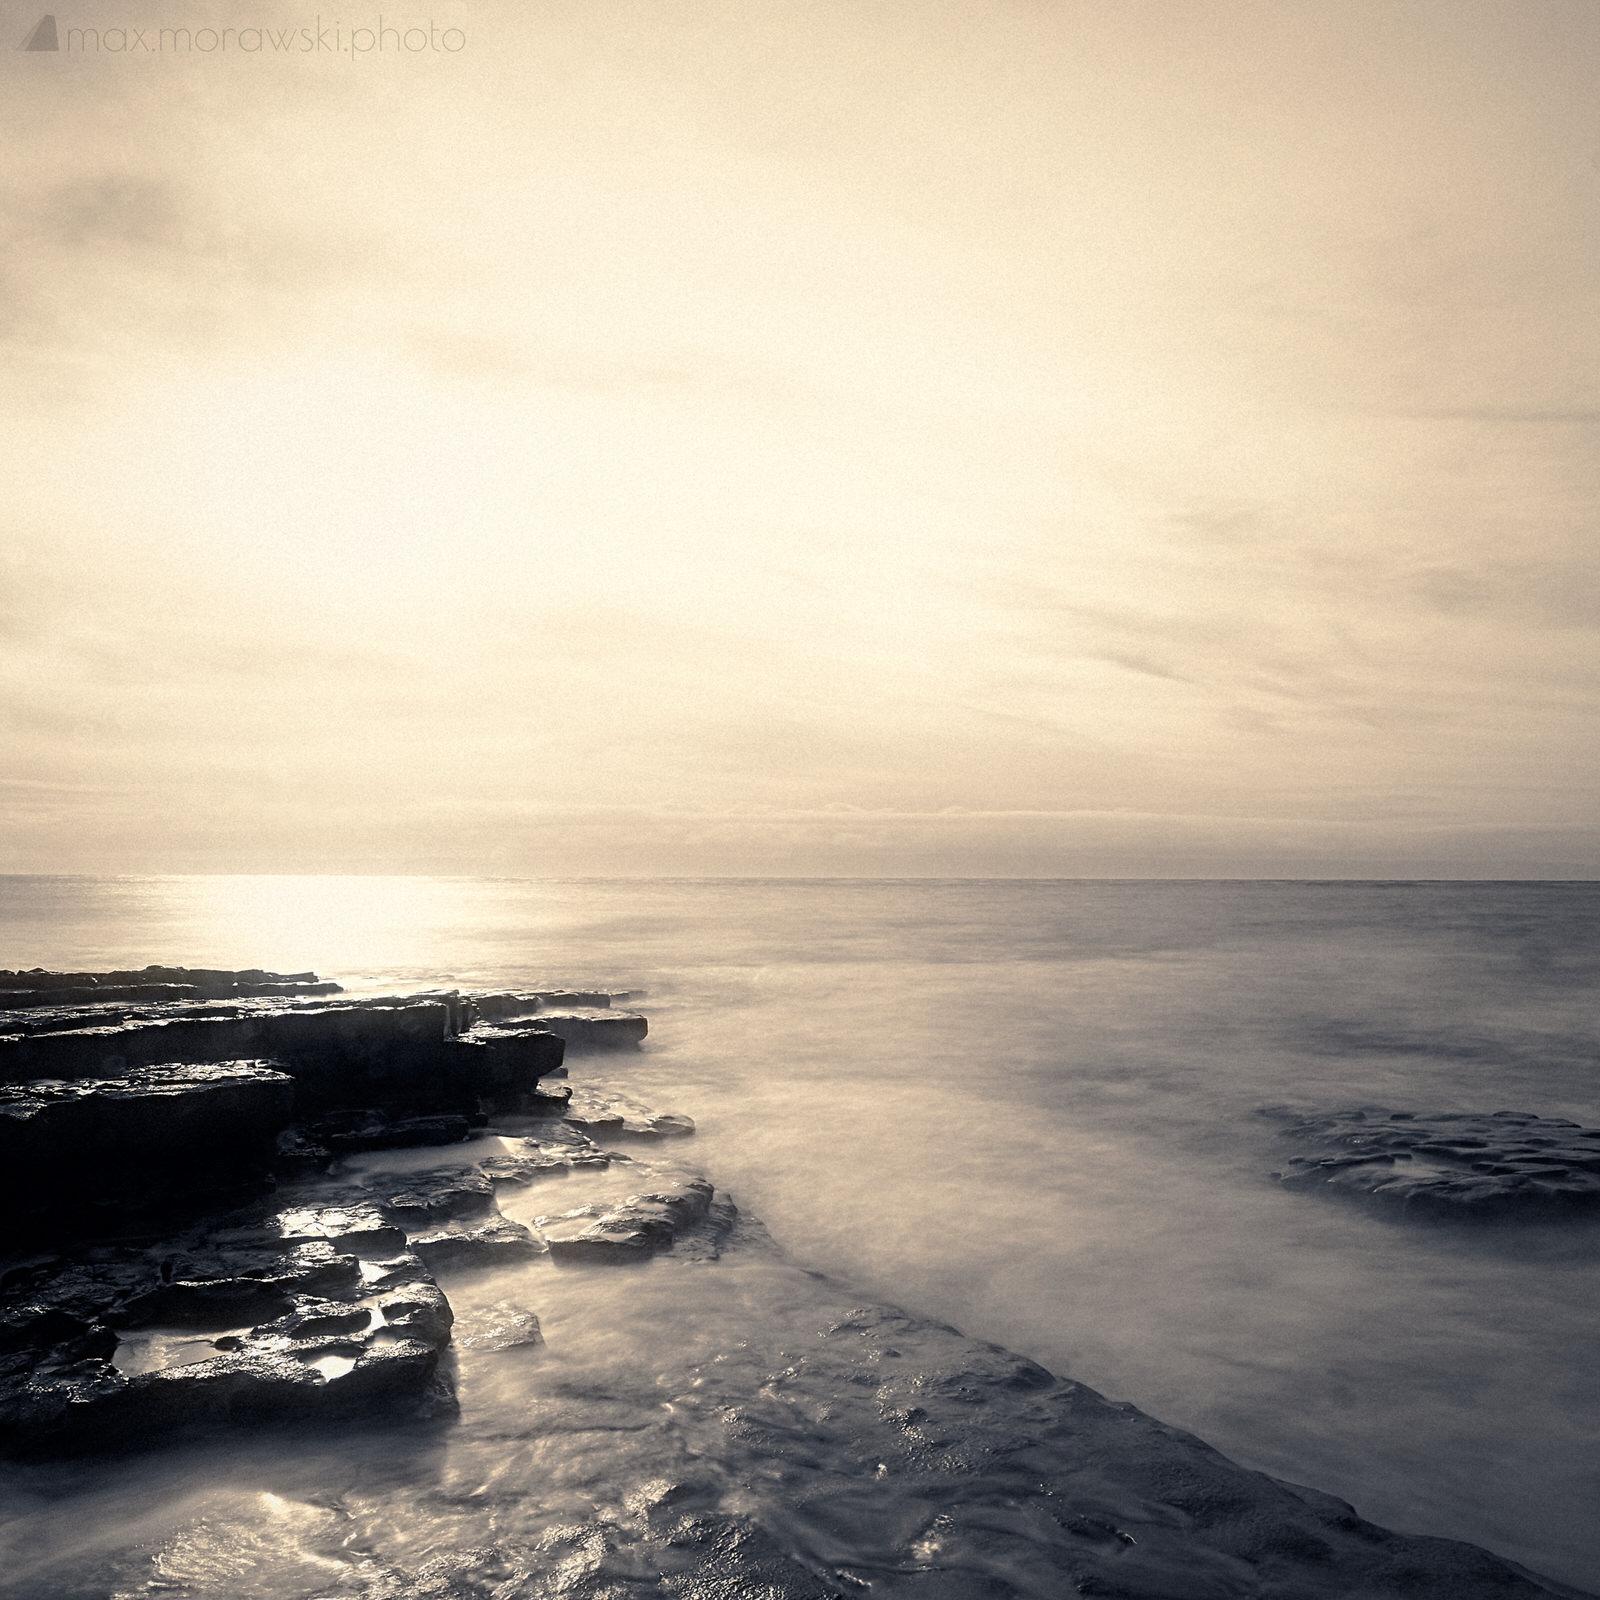 Third Sun, Amber Bay of Ziy (looking west)